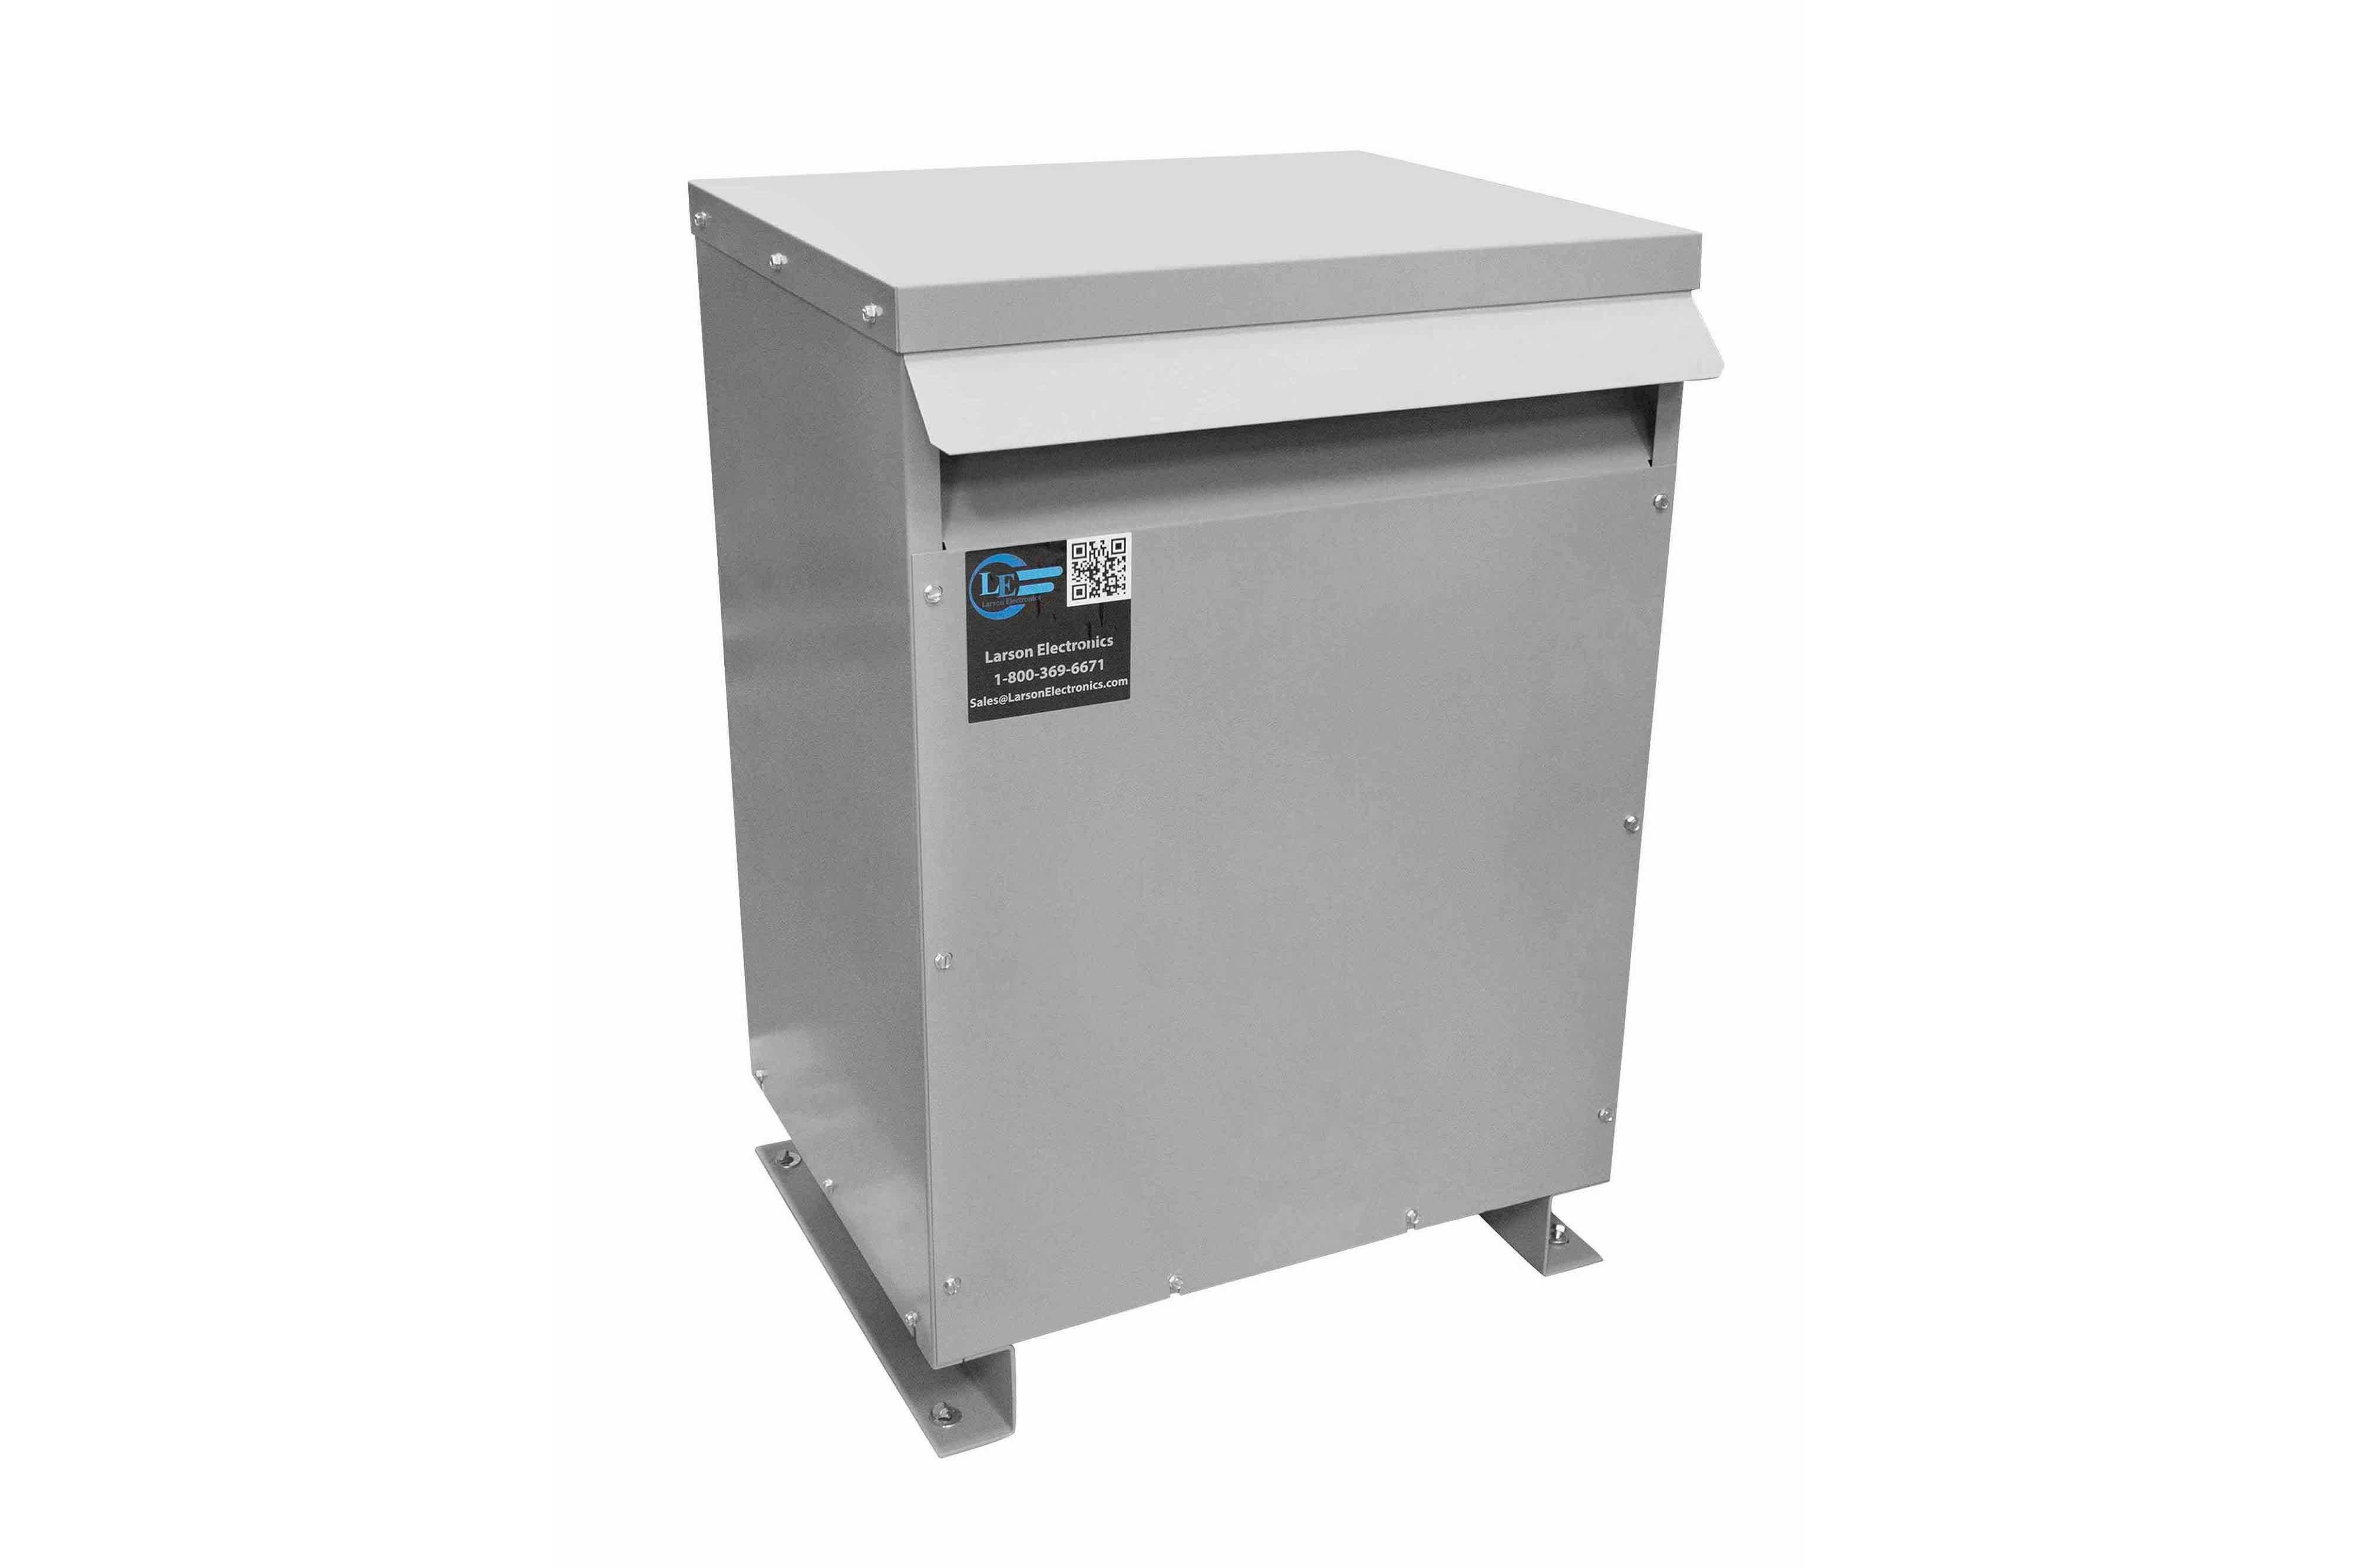 38 kVA 3PH Isolation Transformer, 230V Wye Primary, 480V Delta Secondary, N3R, Ventilated, 60 Hz